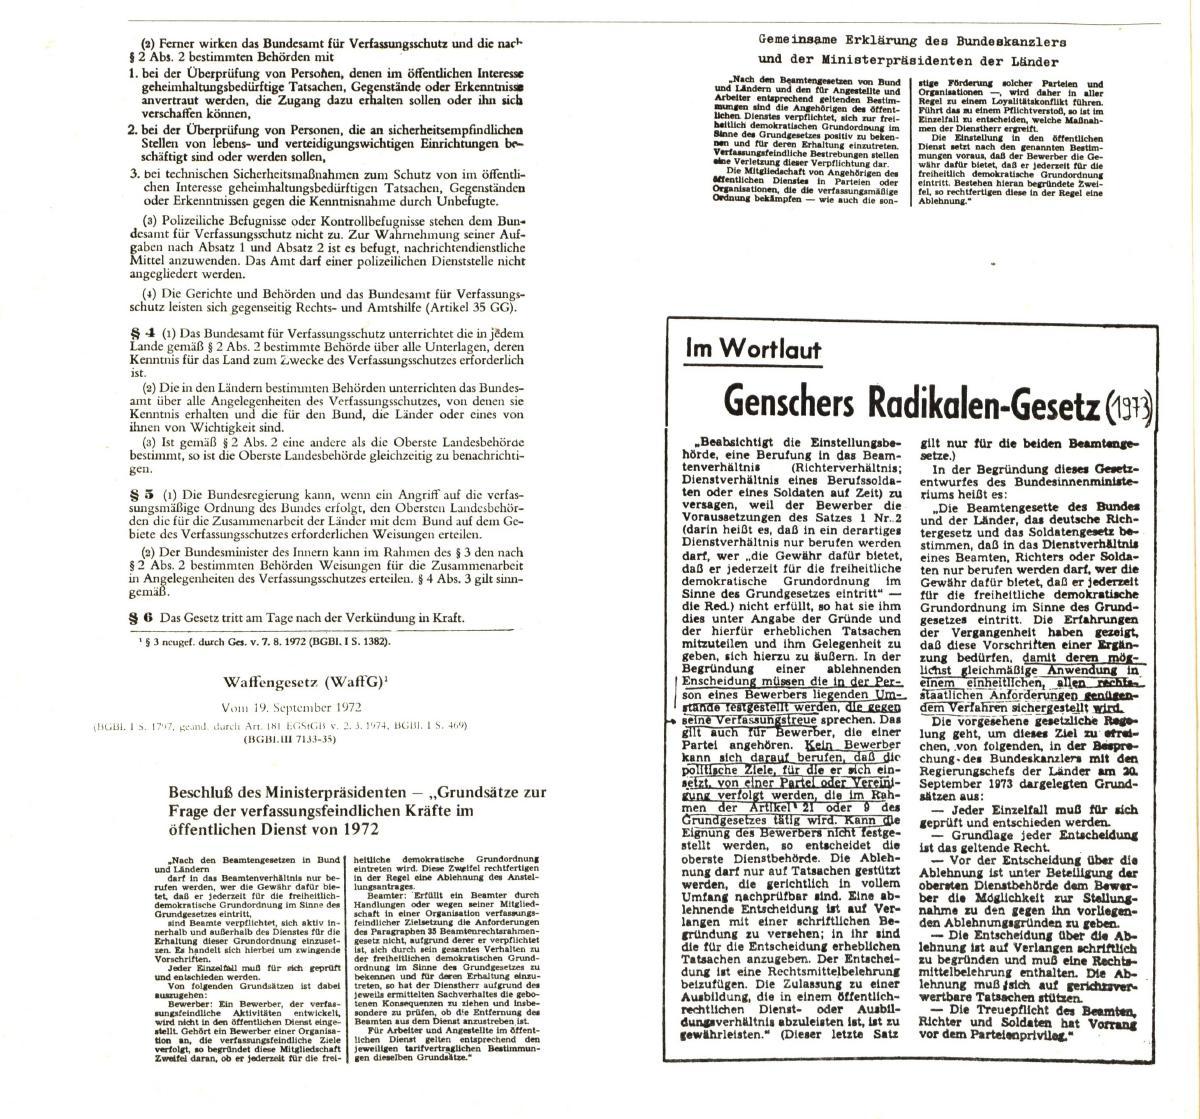 REP_VLB_1976_Die_Zensurgesetze_45